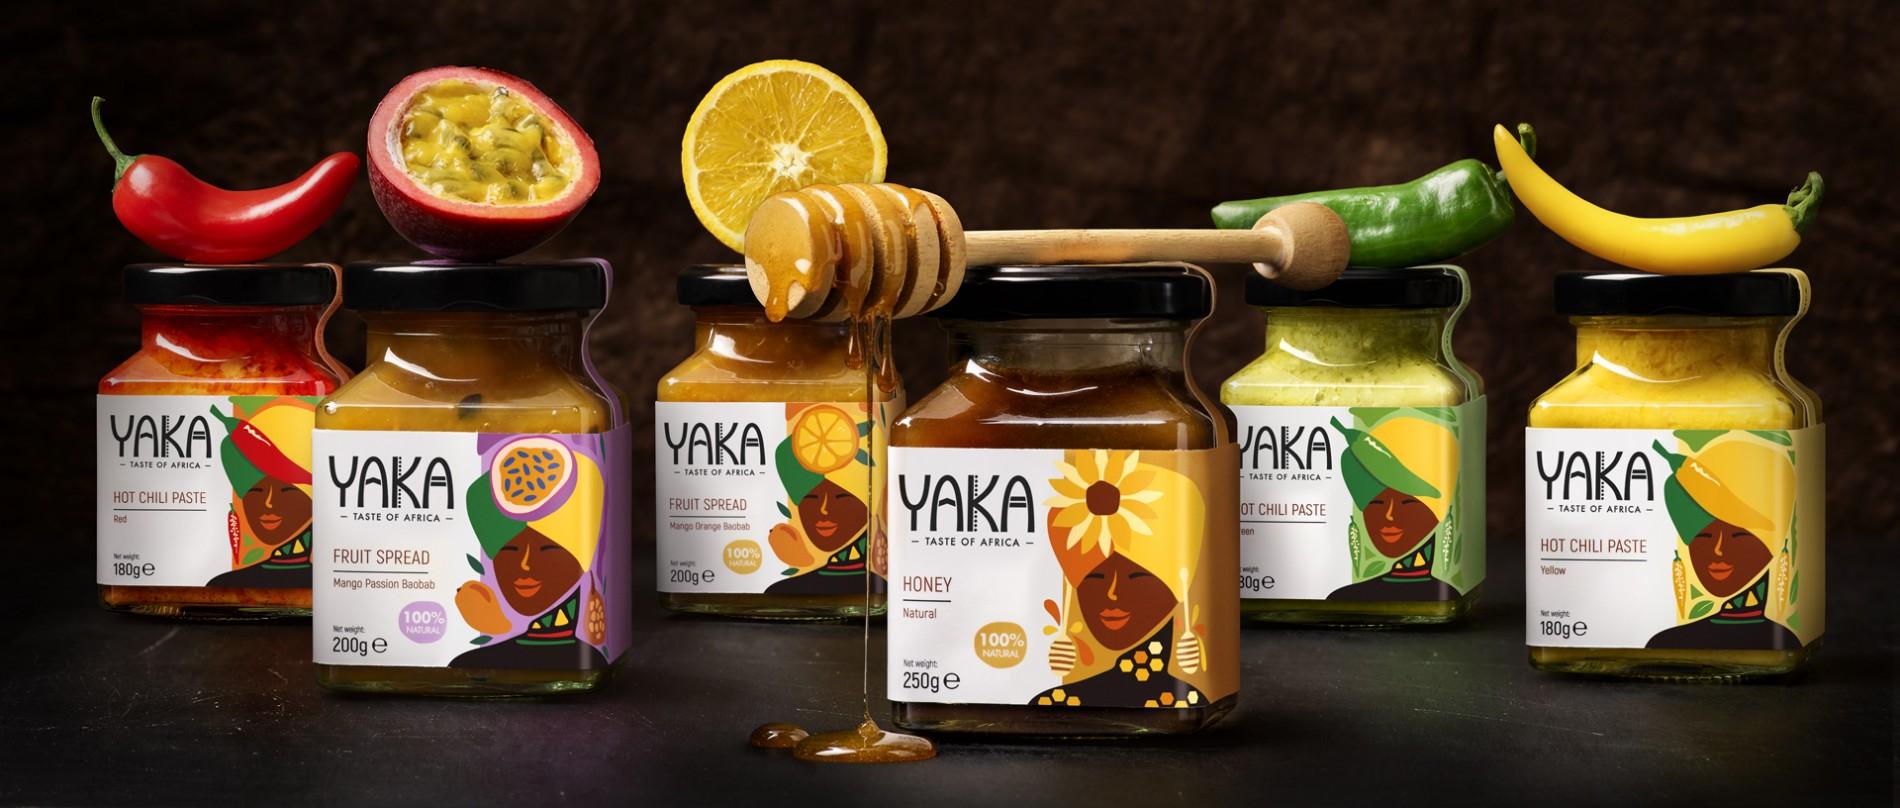 Quatre Mains package design - Package design Yaka, jams, chili paste, quatre mains